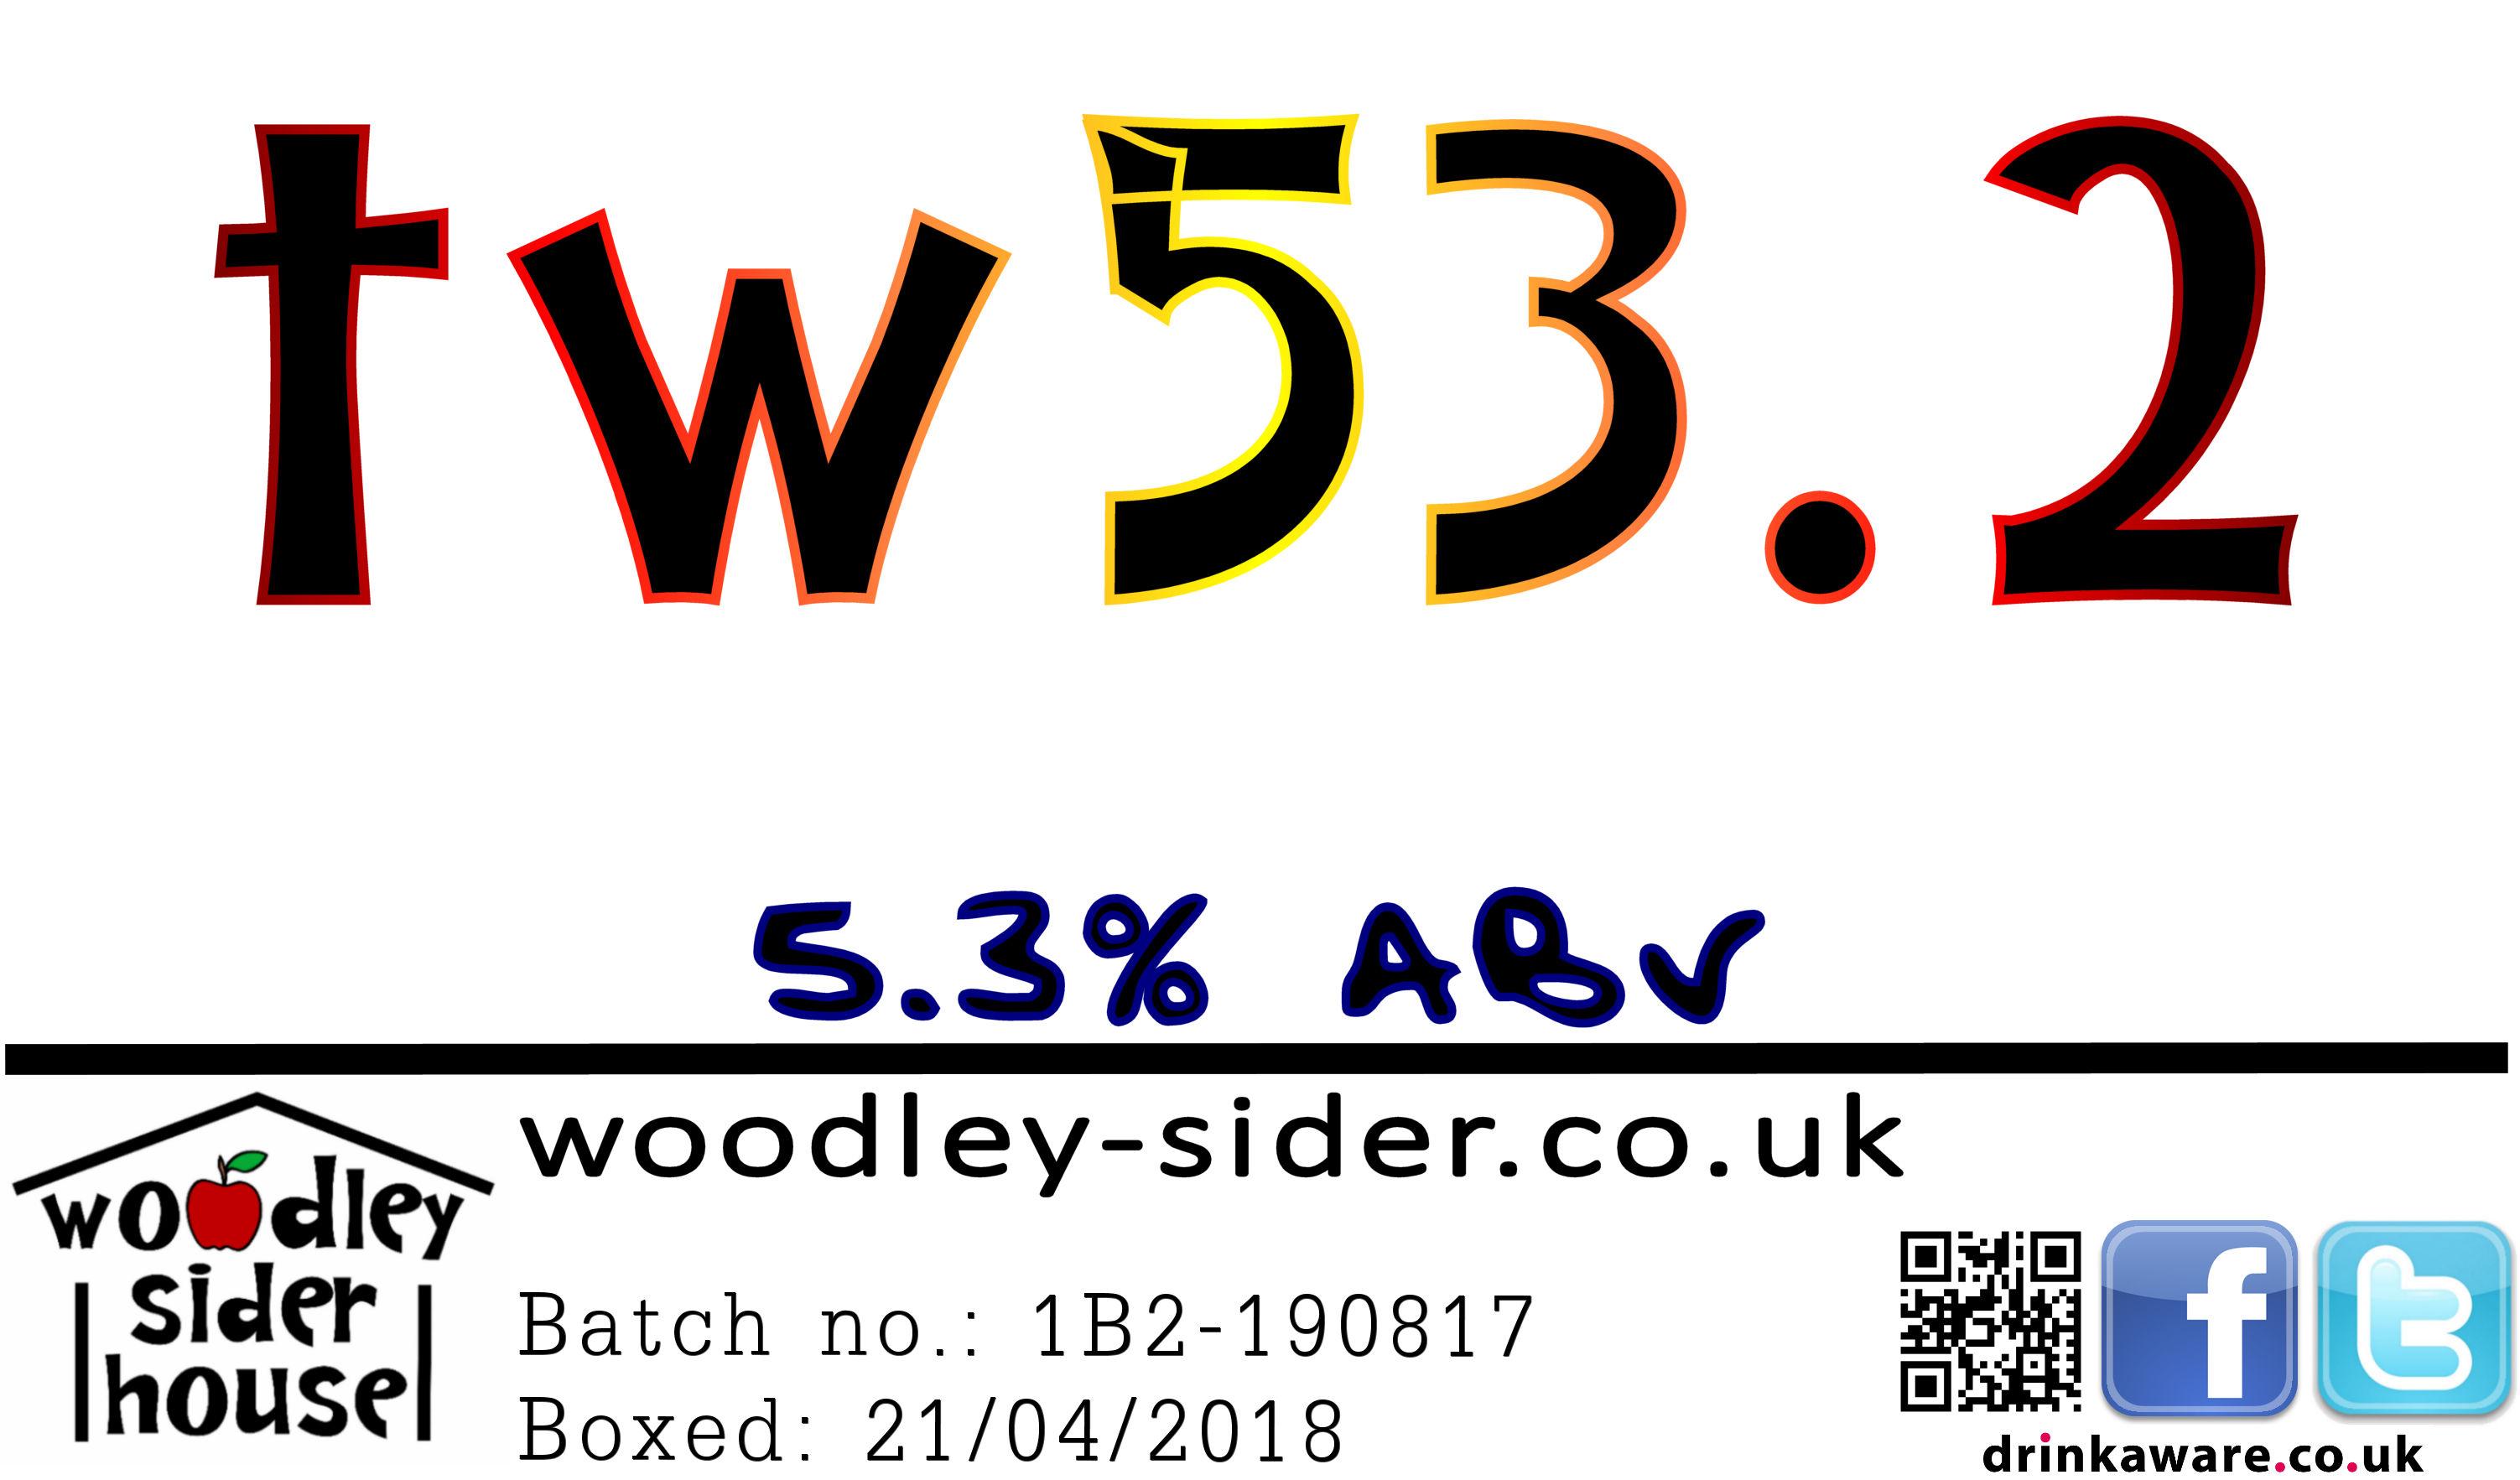 TW53.2